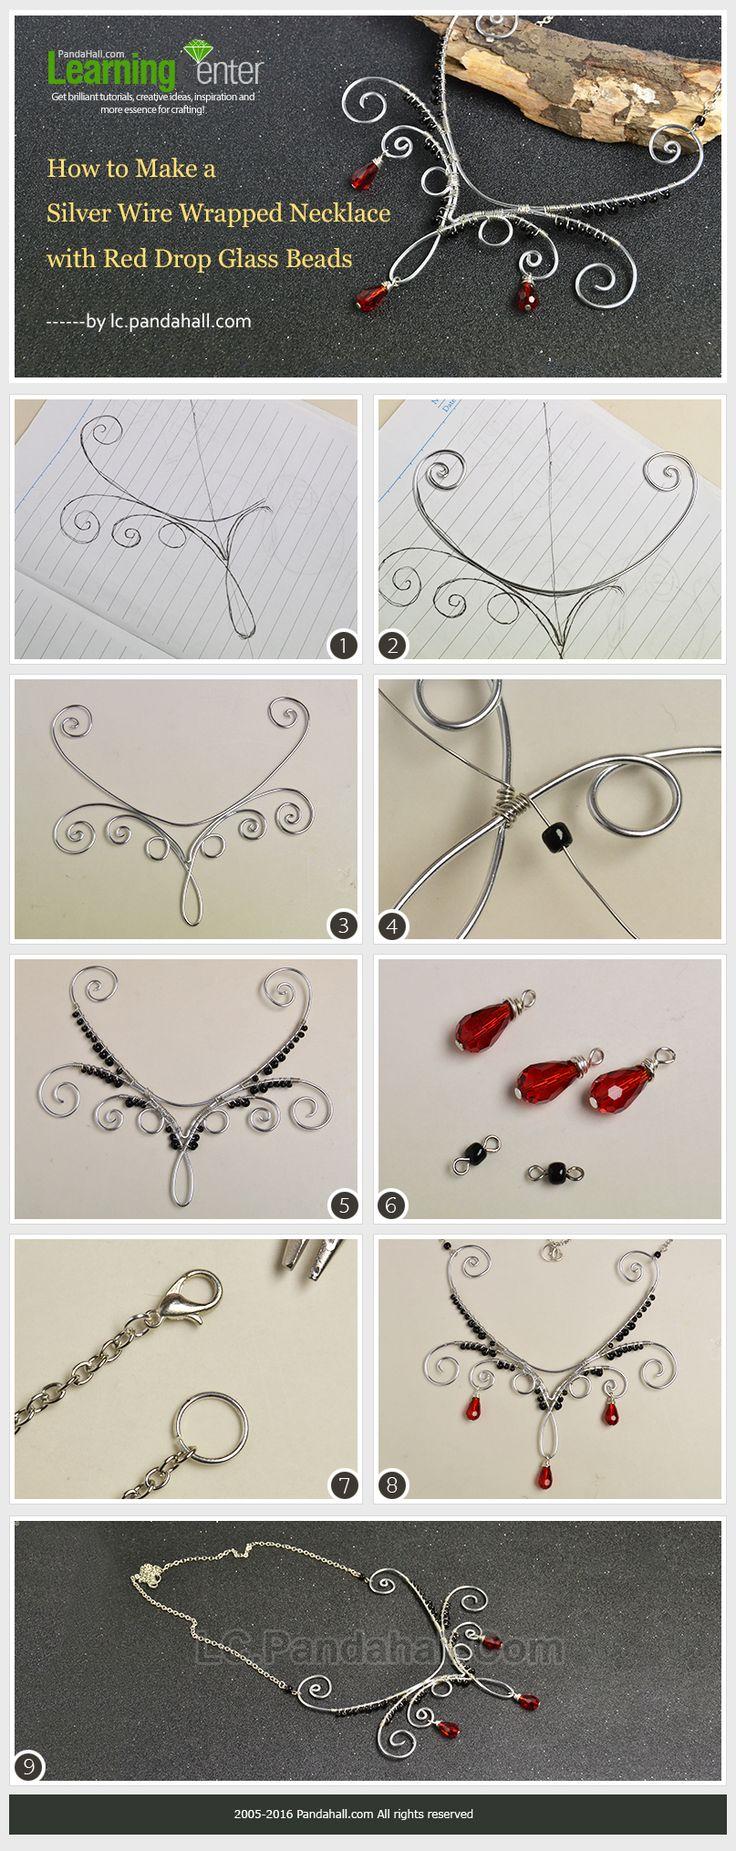 2270 best wire jewelry images on Pinterest | Tutorials, Jewellery ...